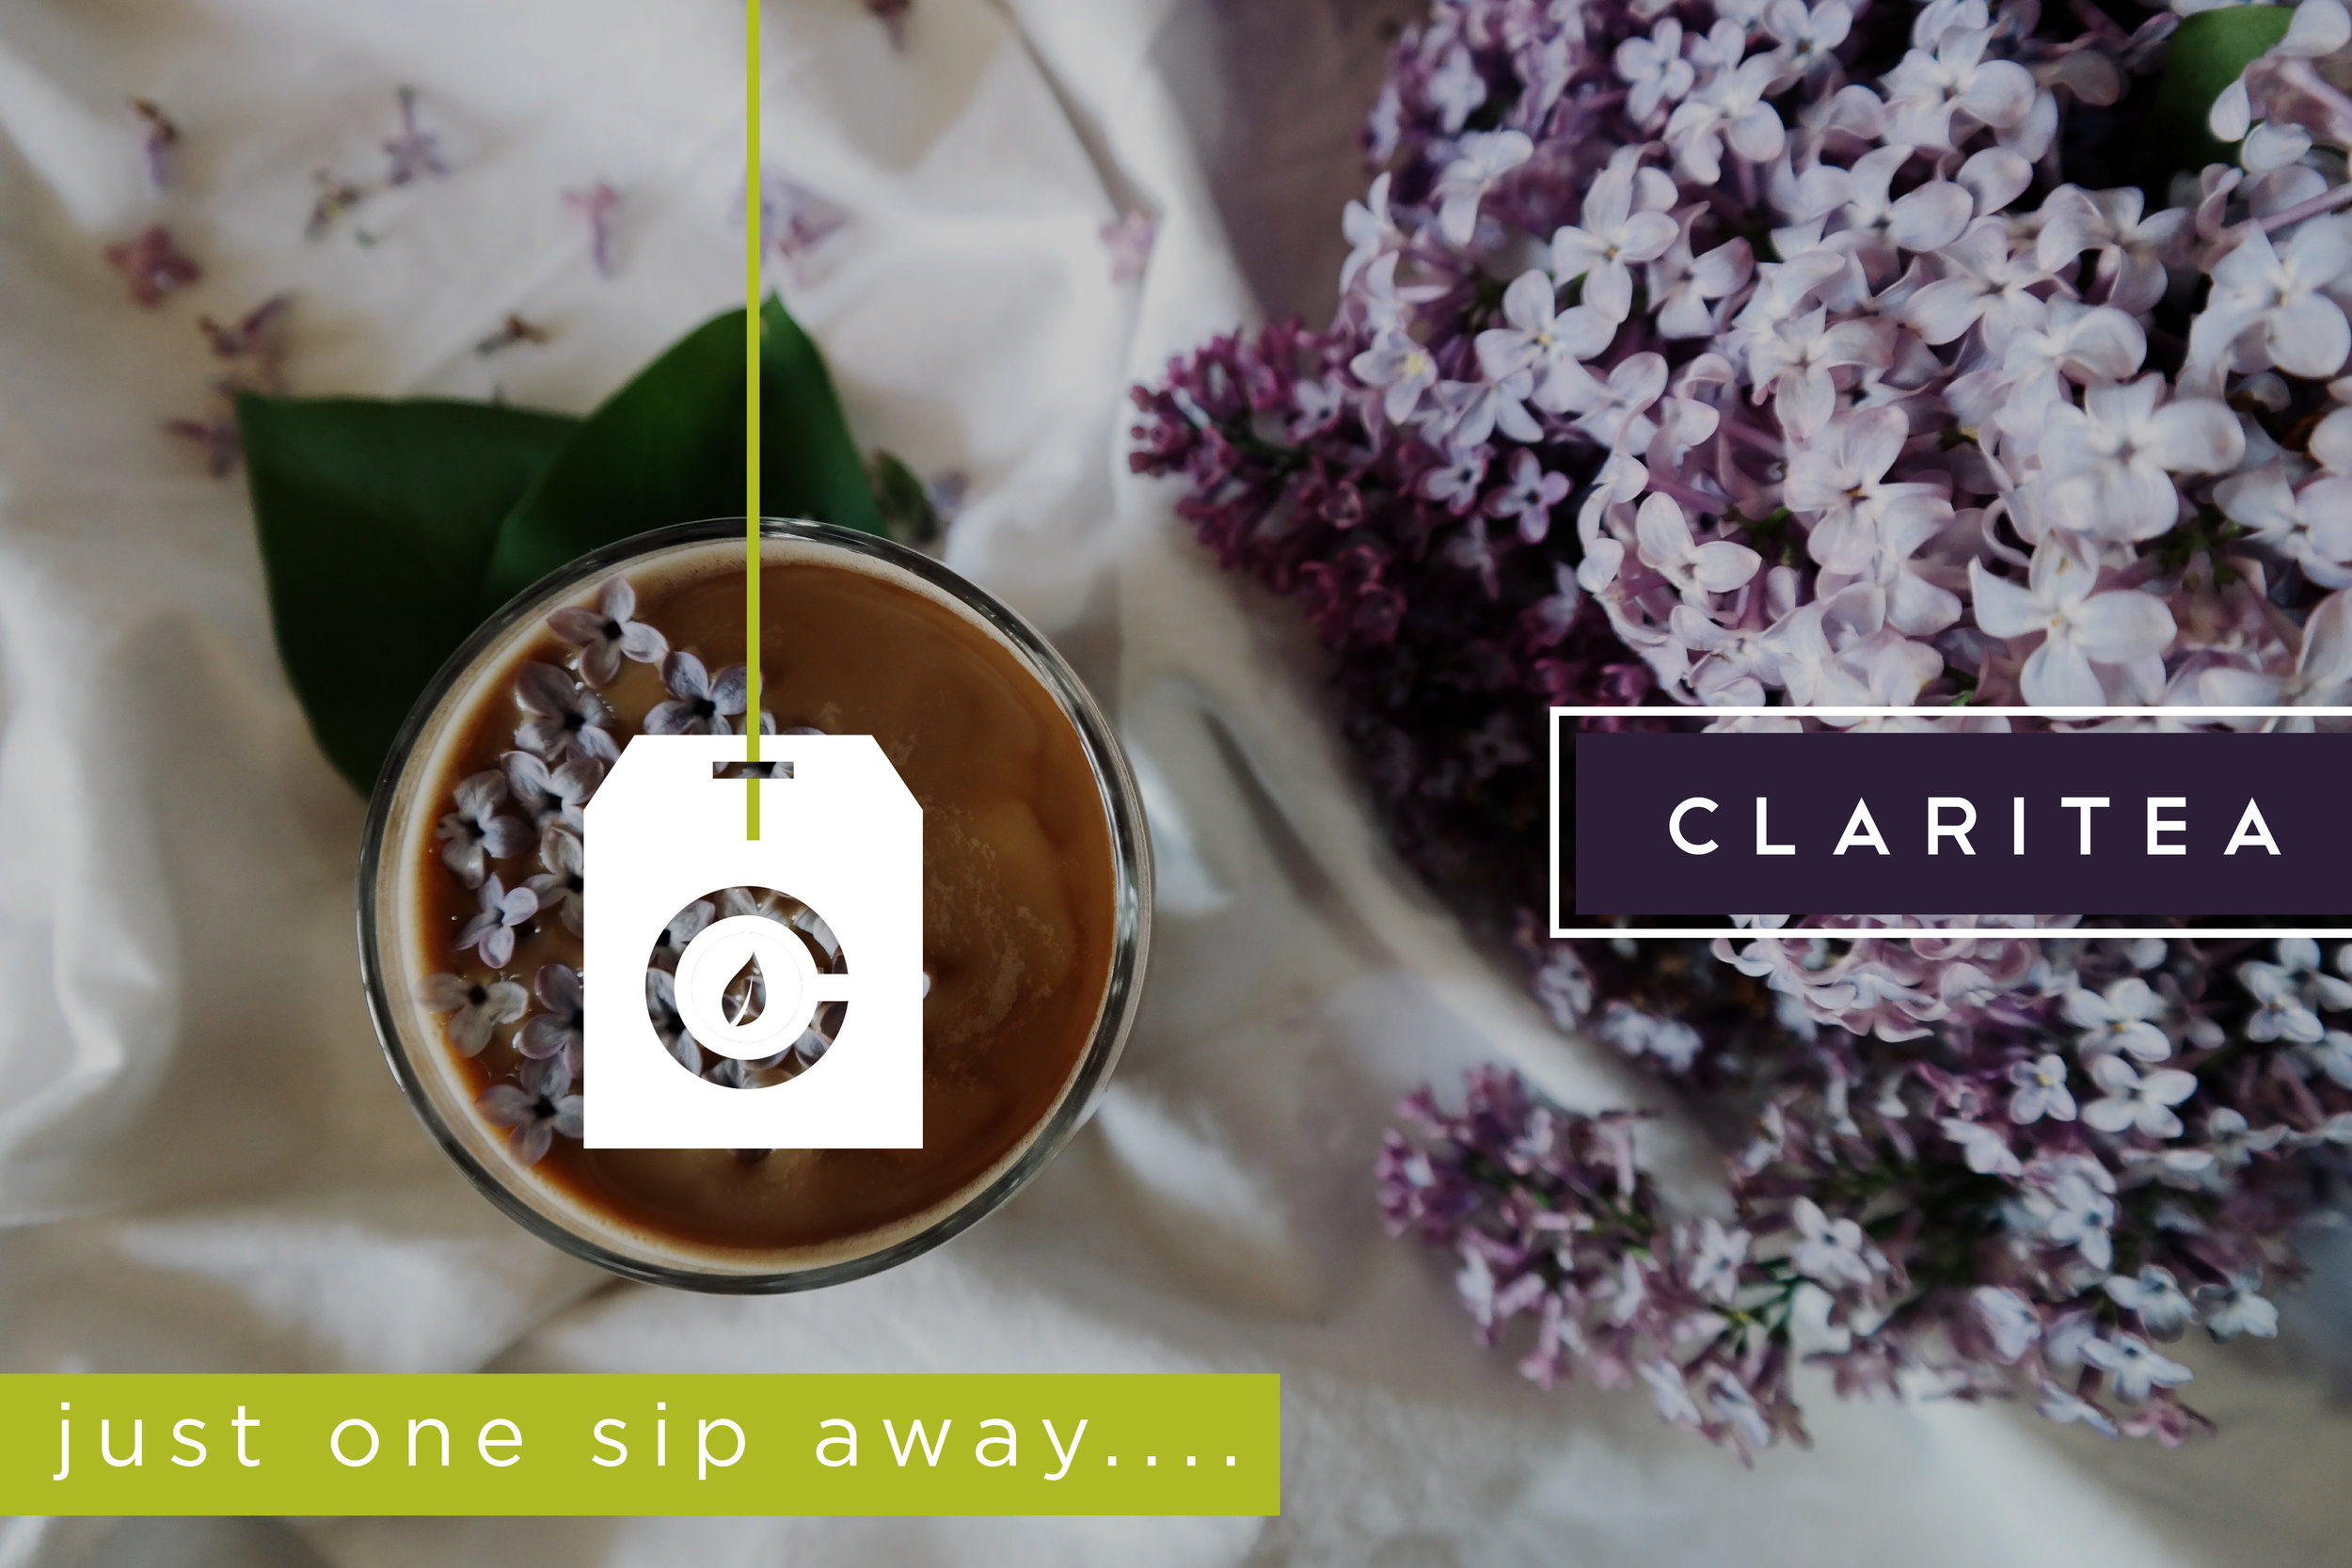 claritea-hang tag .jpg